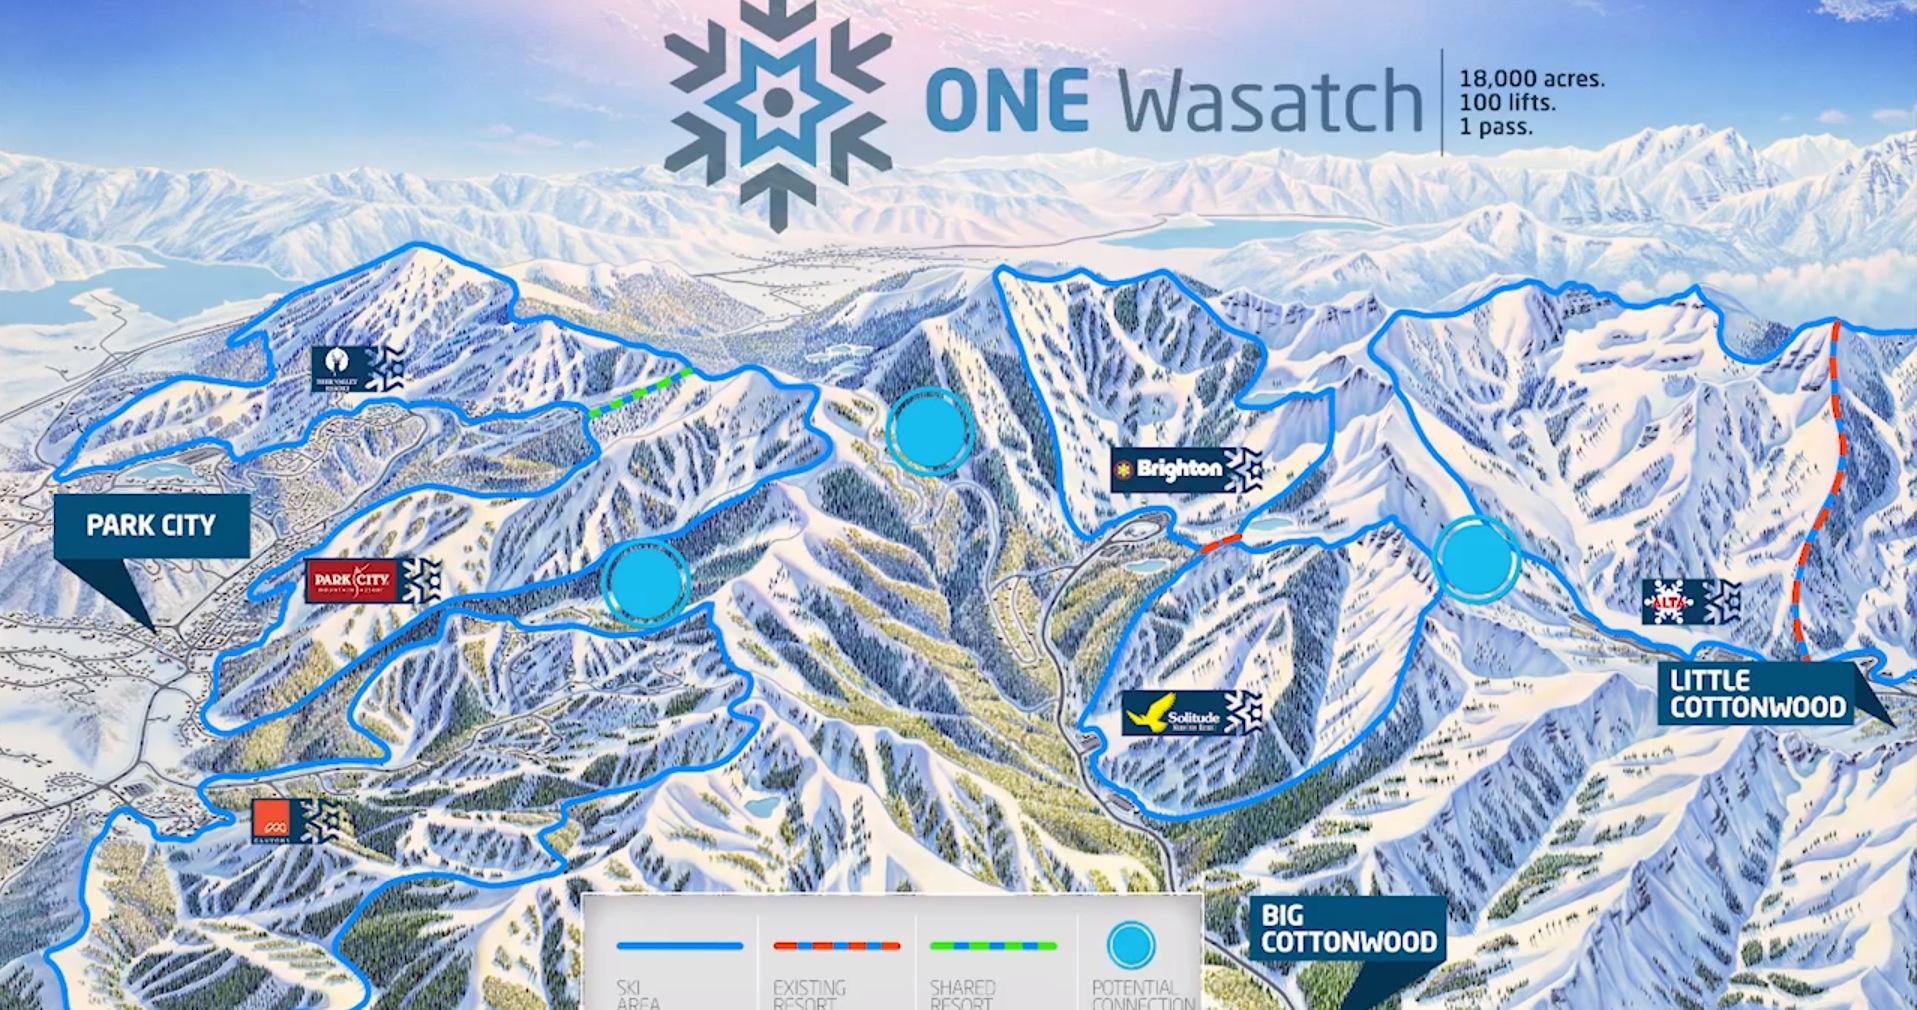 rafferty talks about creating interconnected ski resort | kpcw